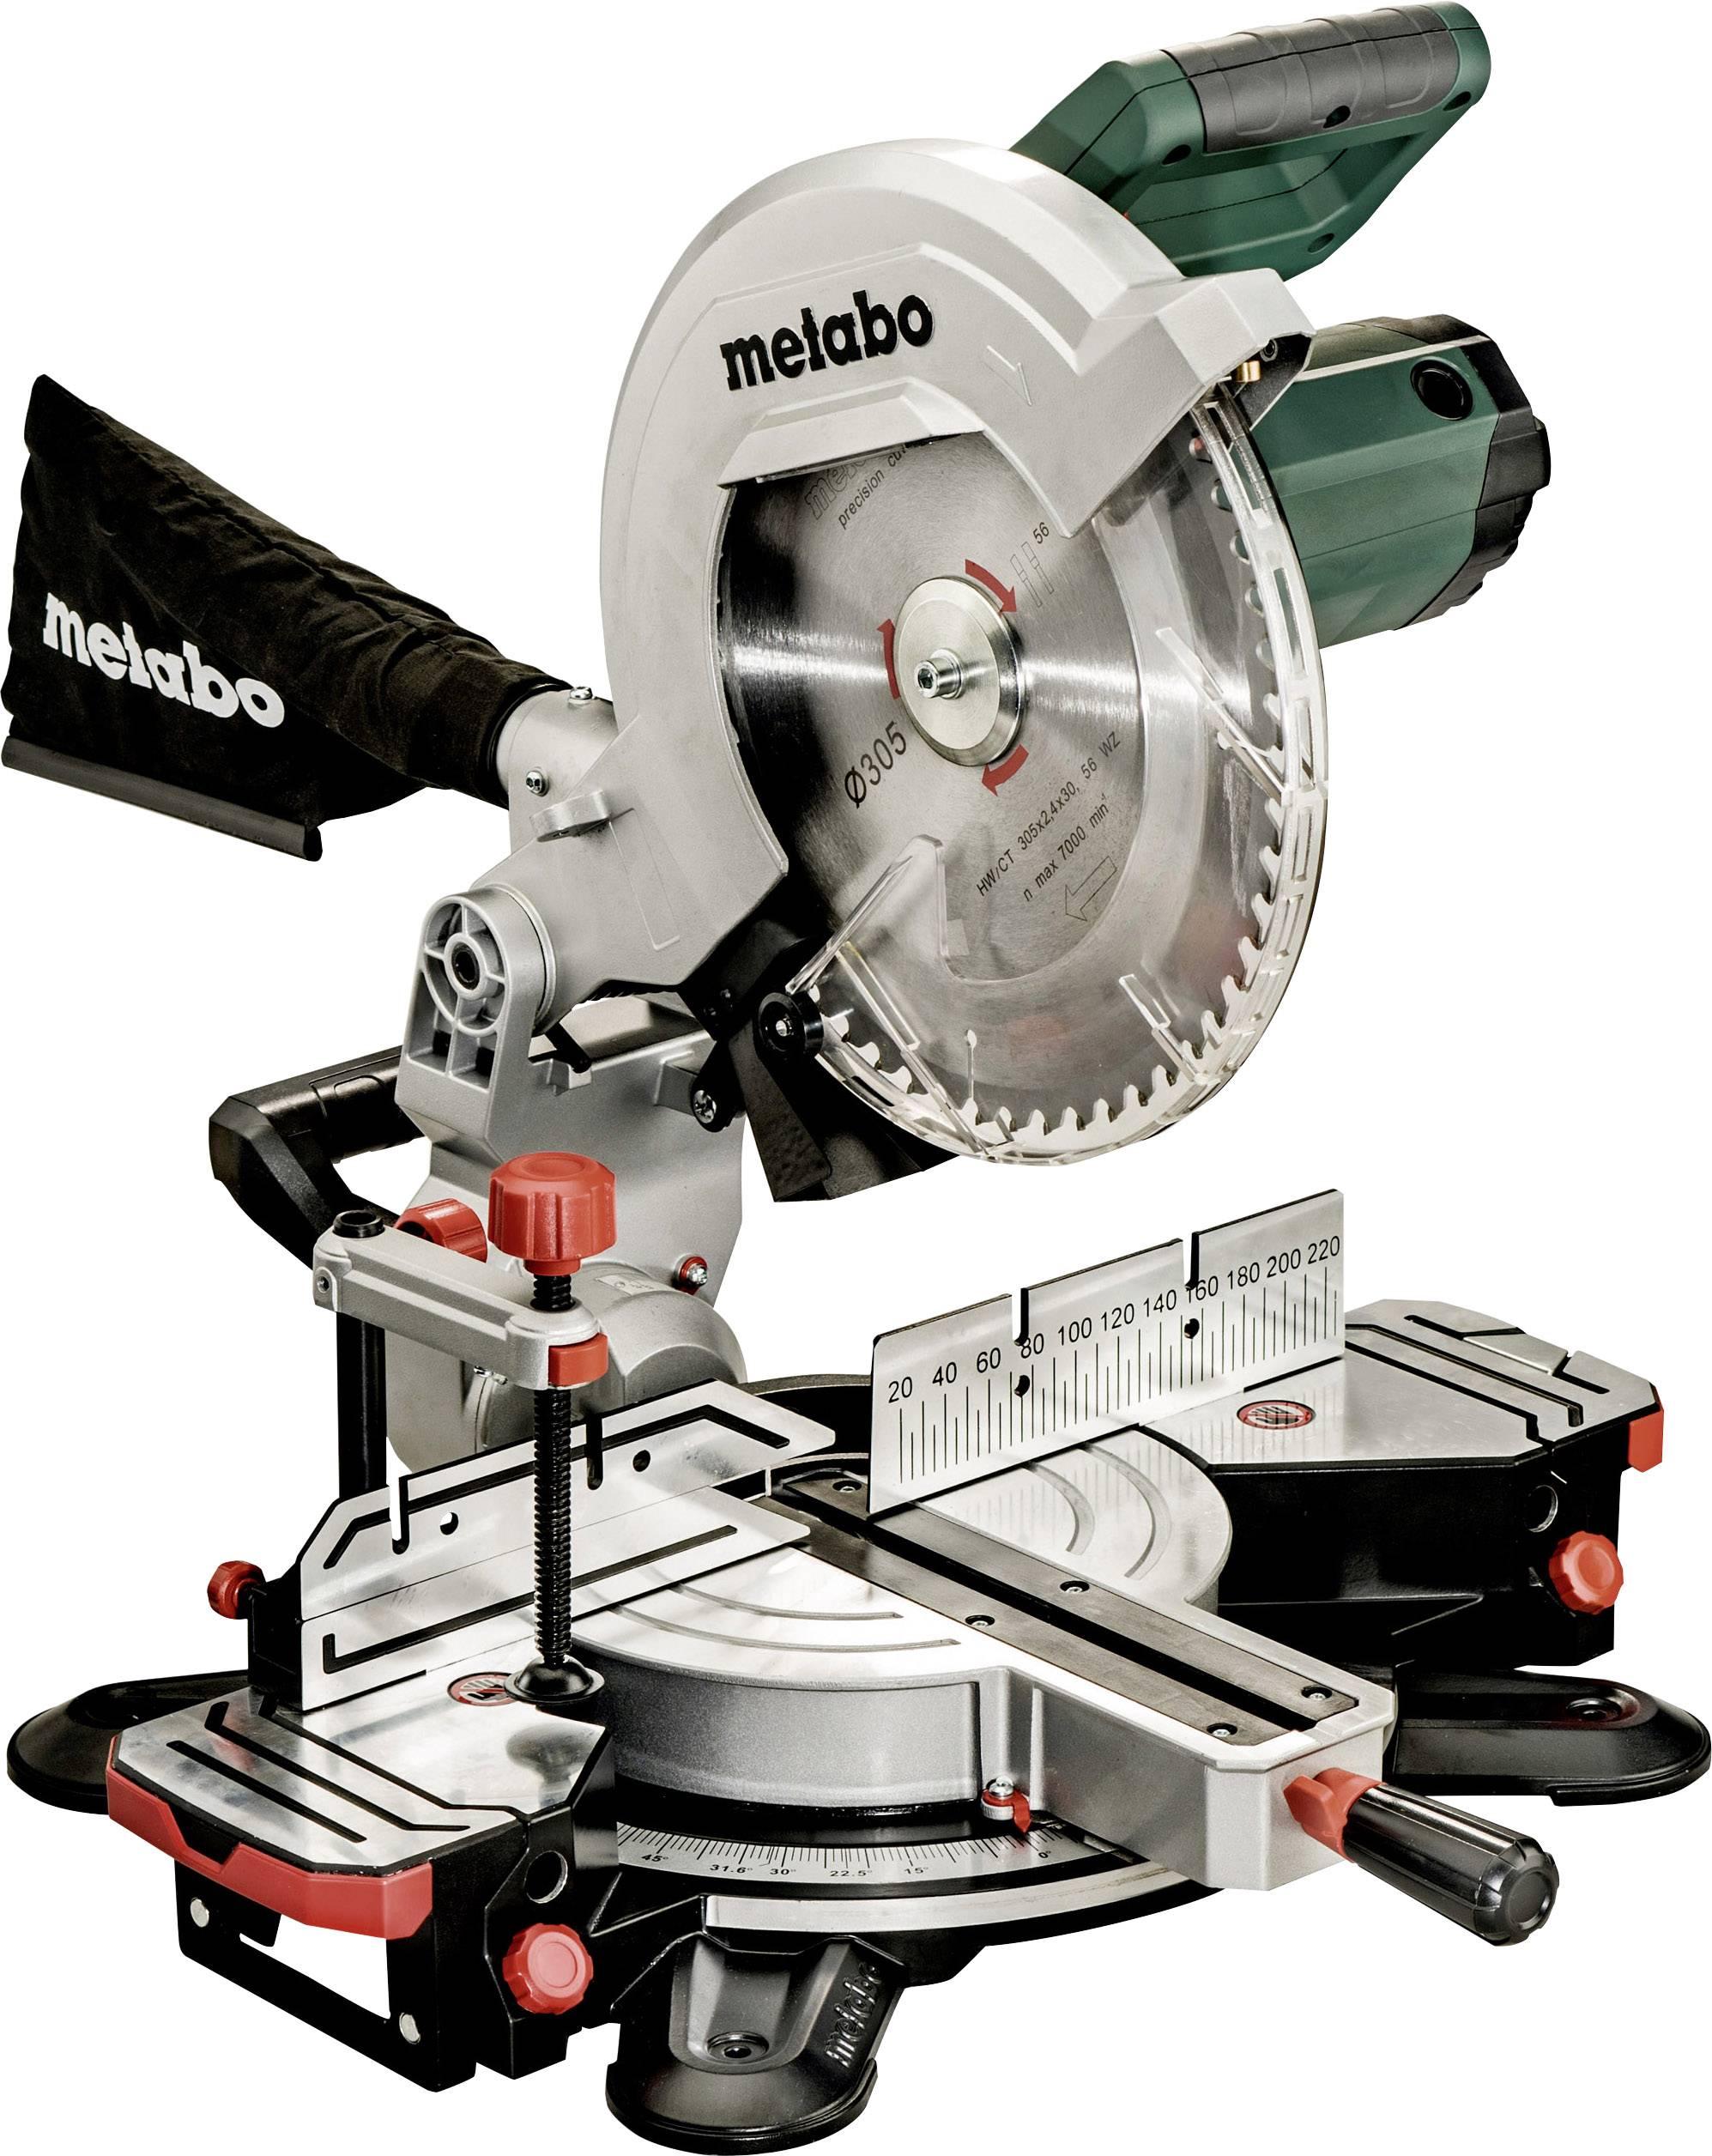 Troncatrice Metabo KS 305 M 305 mm